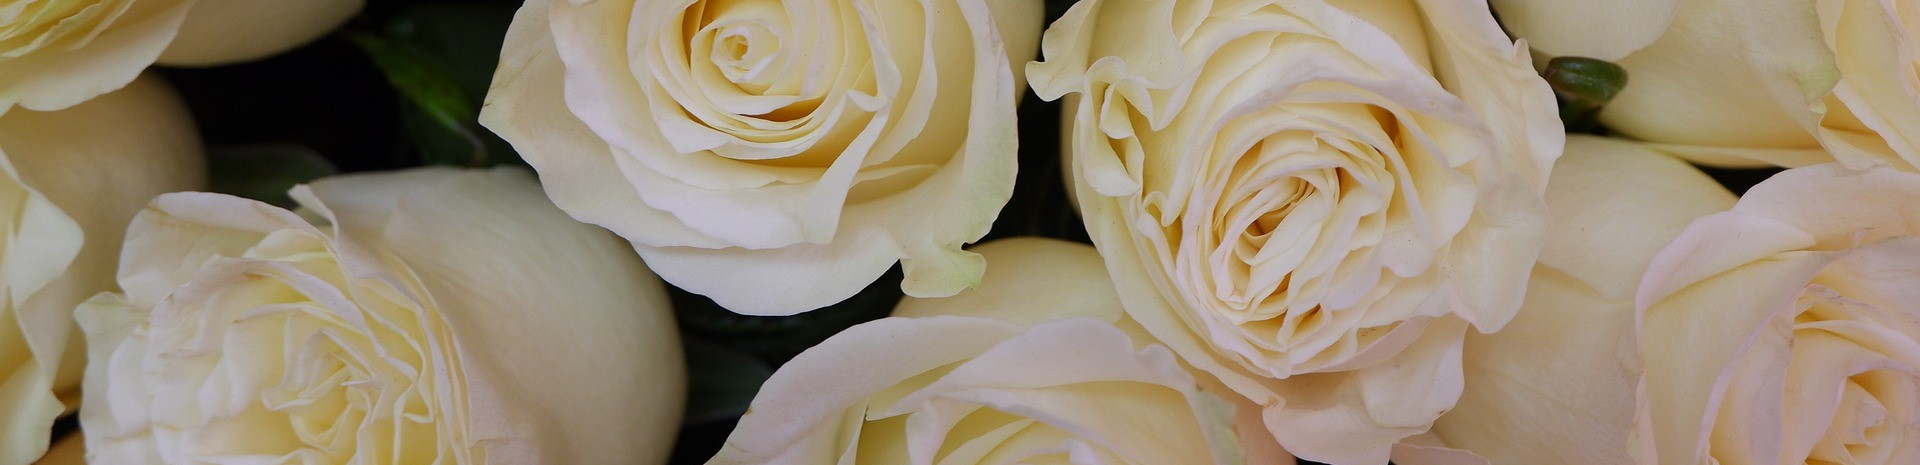 roses-g2b7cf9bfc_1920000.jpeg